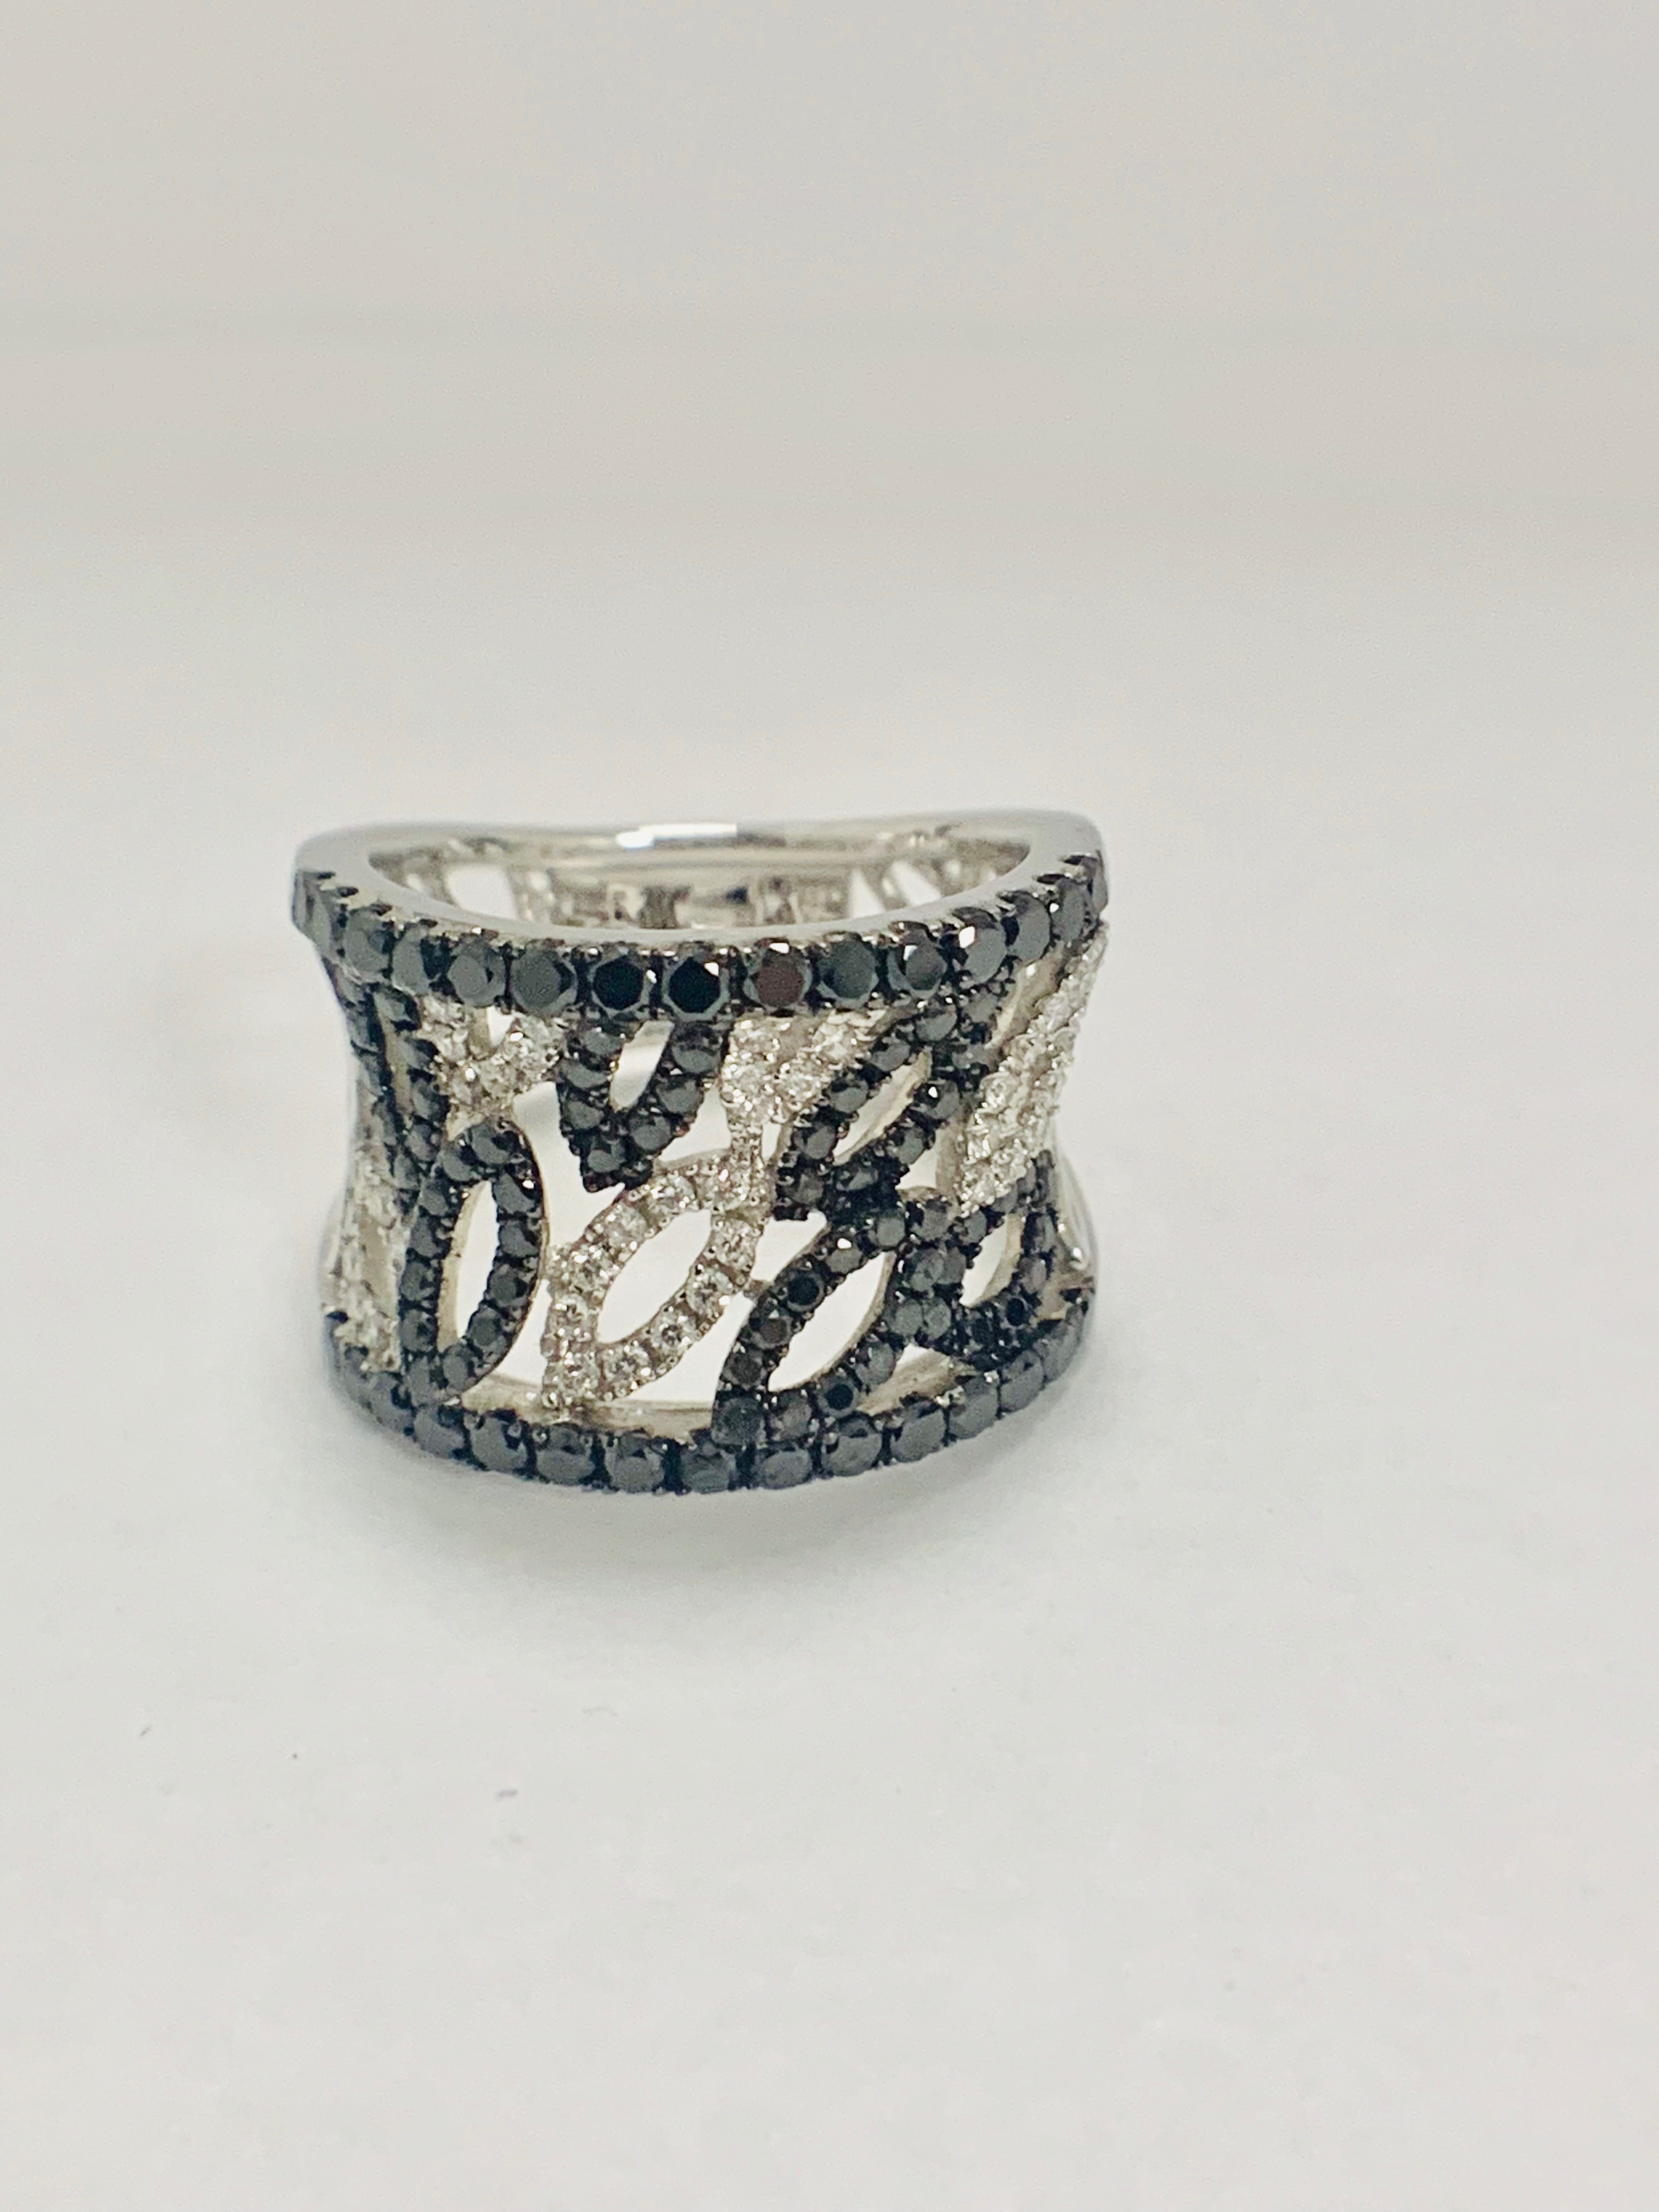 18ct White Gold Diamond ring featuring 90 round cut, black Diamonds (1.14ct TBDW) - Image 12 of 15